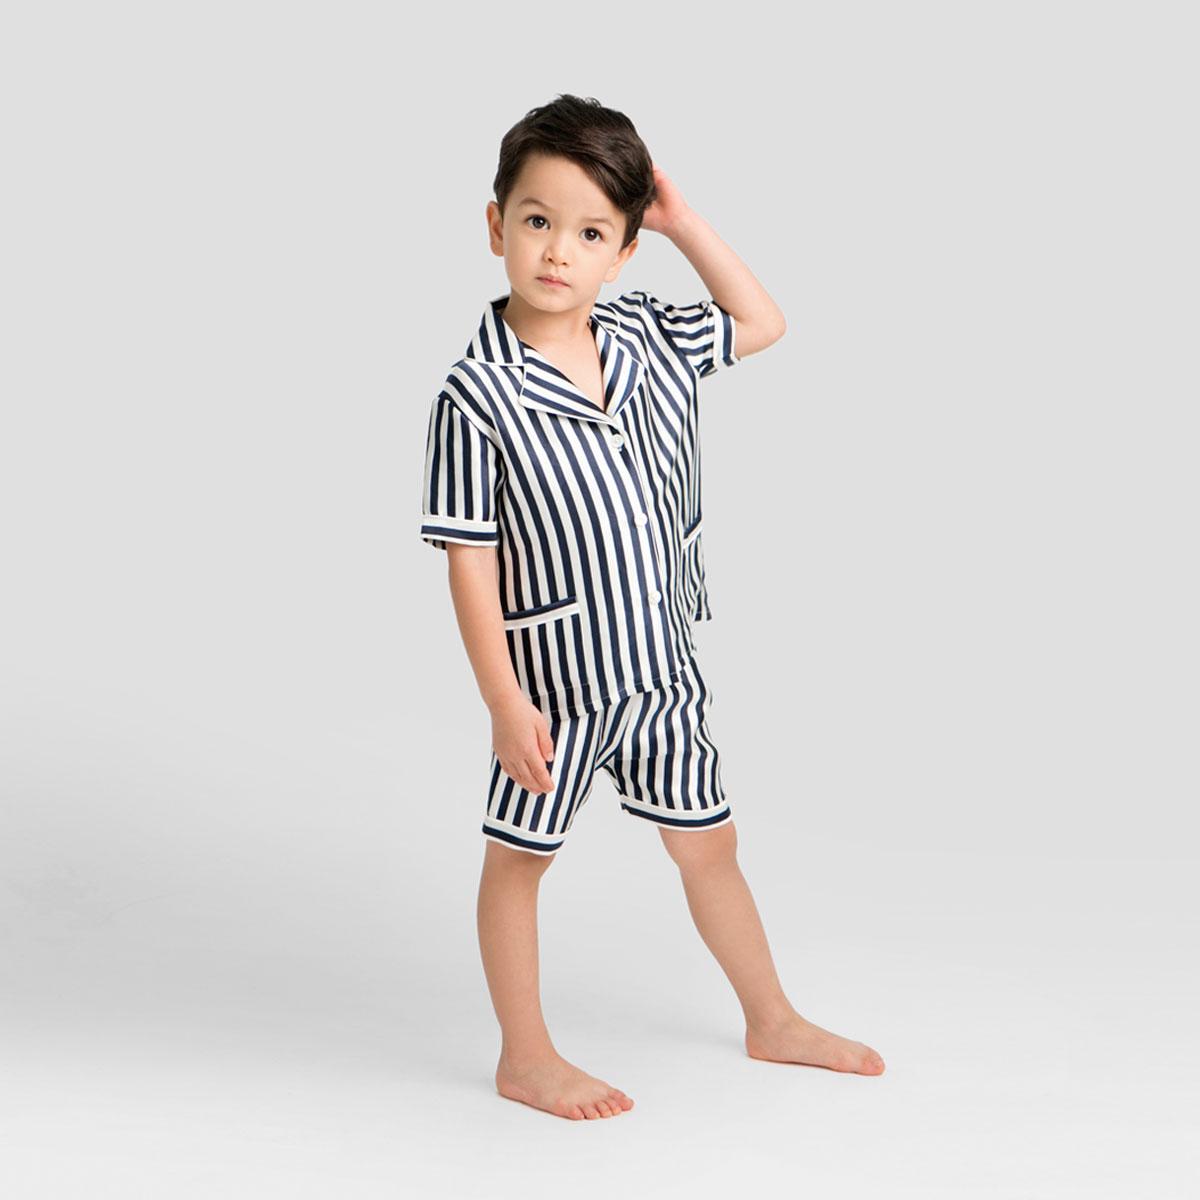 Stripe婴童睡衣短套装